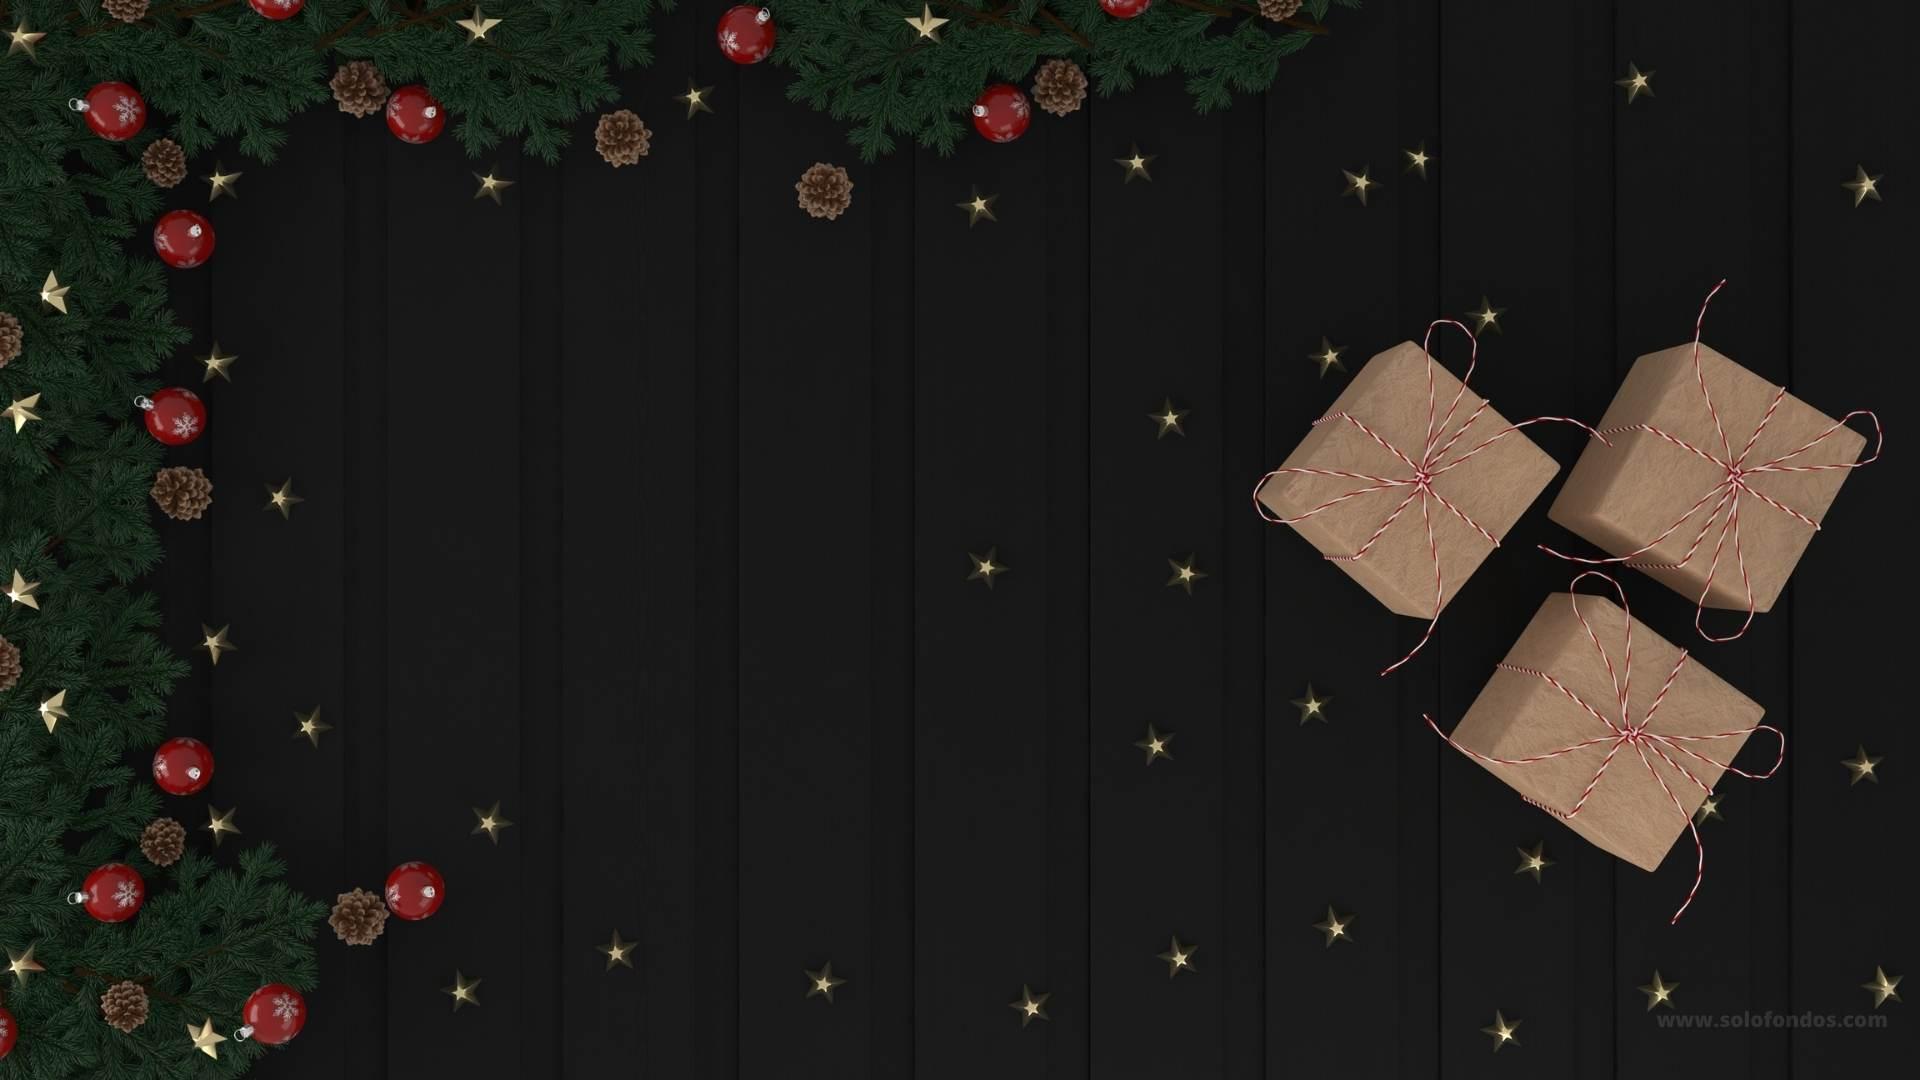 ondos navideños bonitos